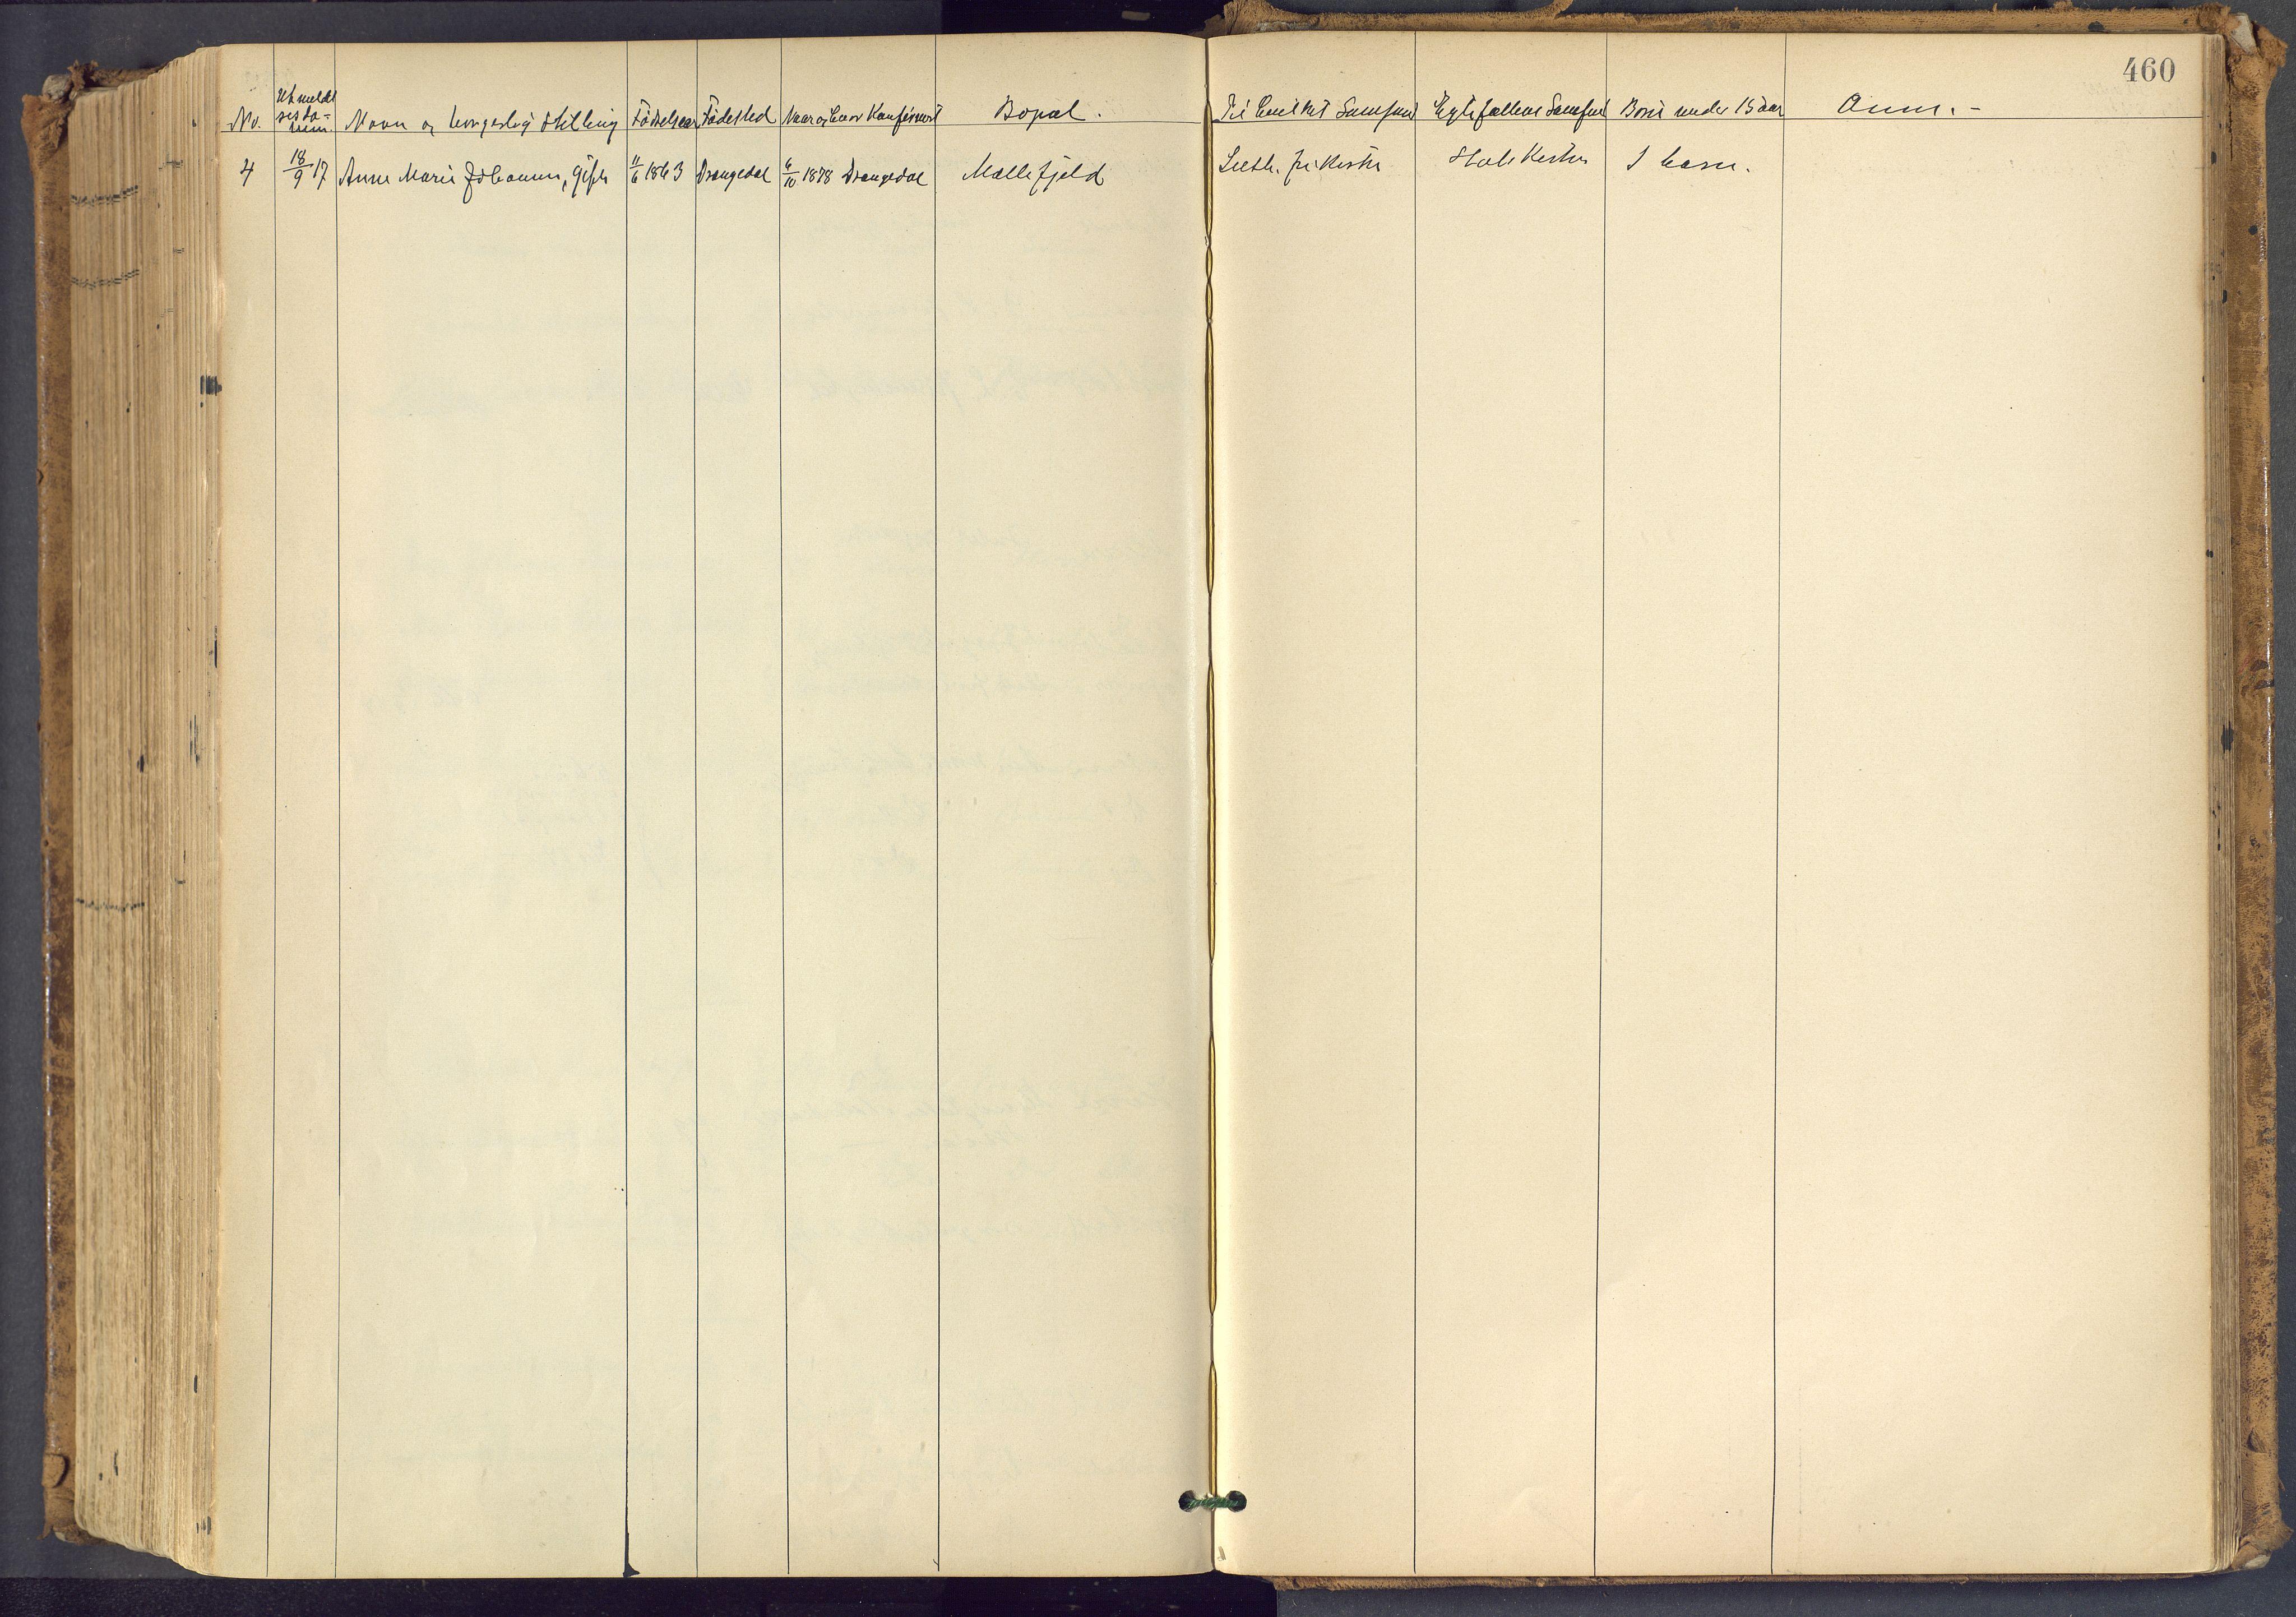 SAKO, Bamble kirkebøker, F/Fa/L0009: Ministerialbok nr. I 9, 1901-1917, s. 460